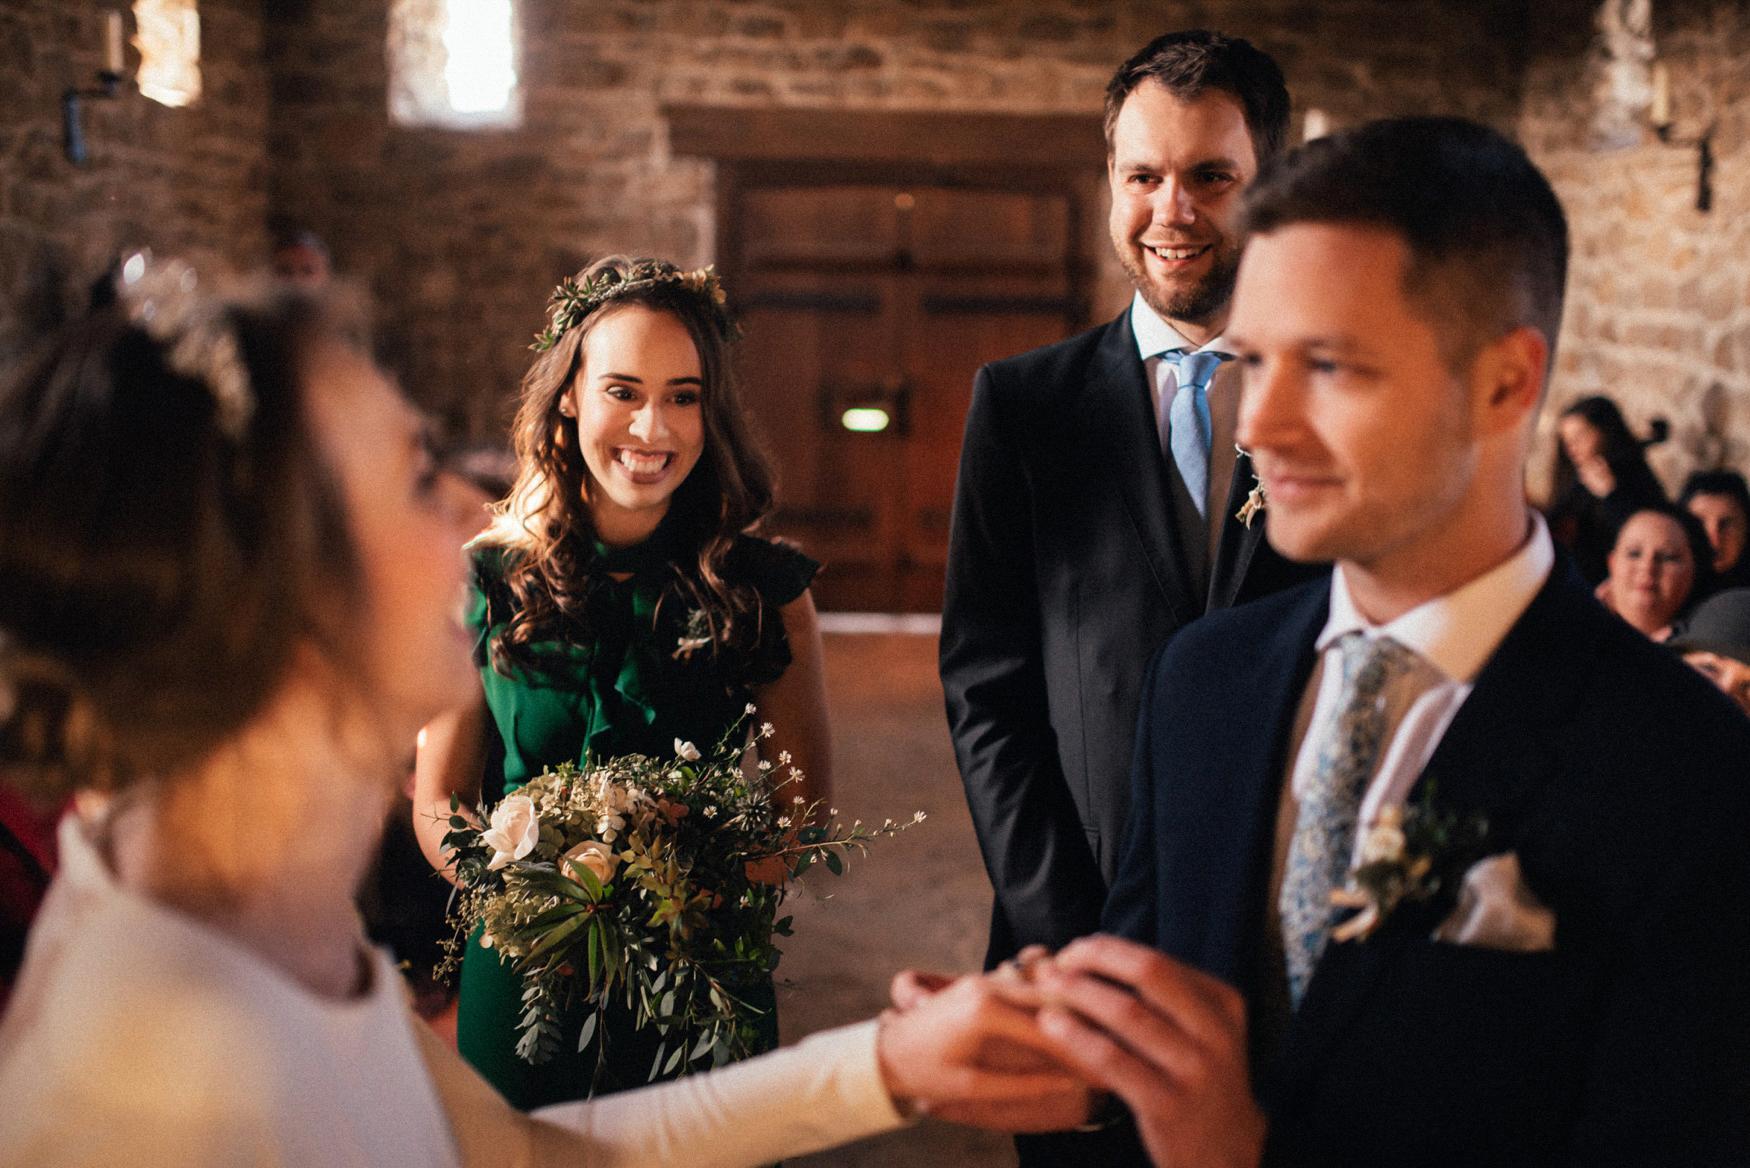 2 prague wedding photographer - boho svatba zikmundov018.jpg